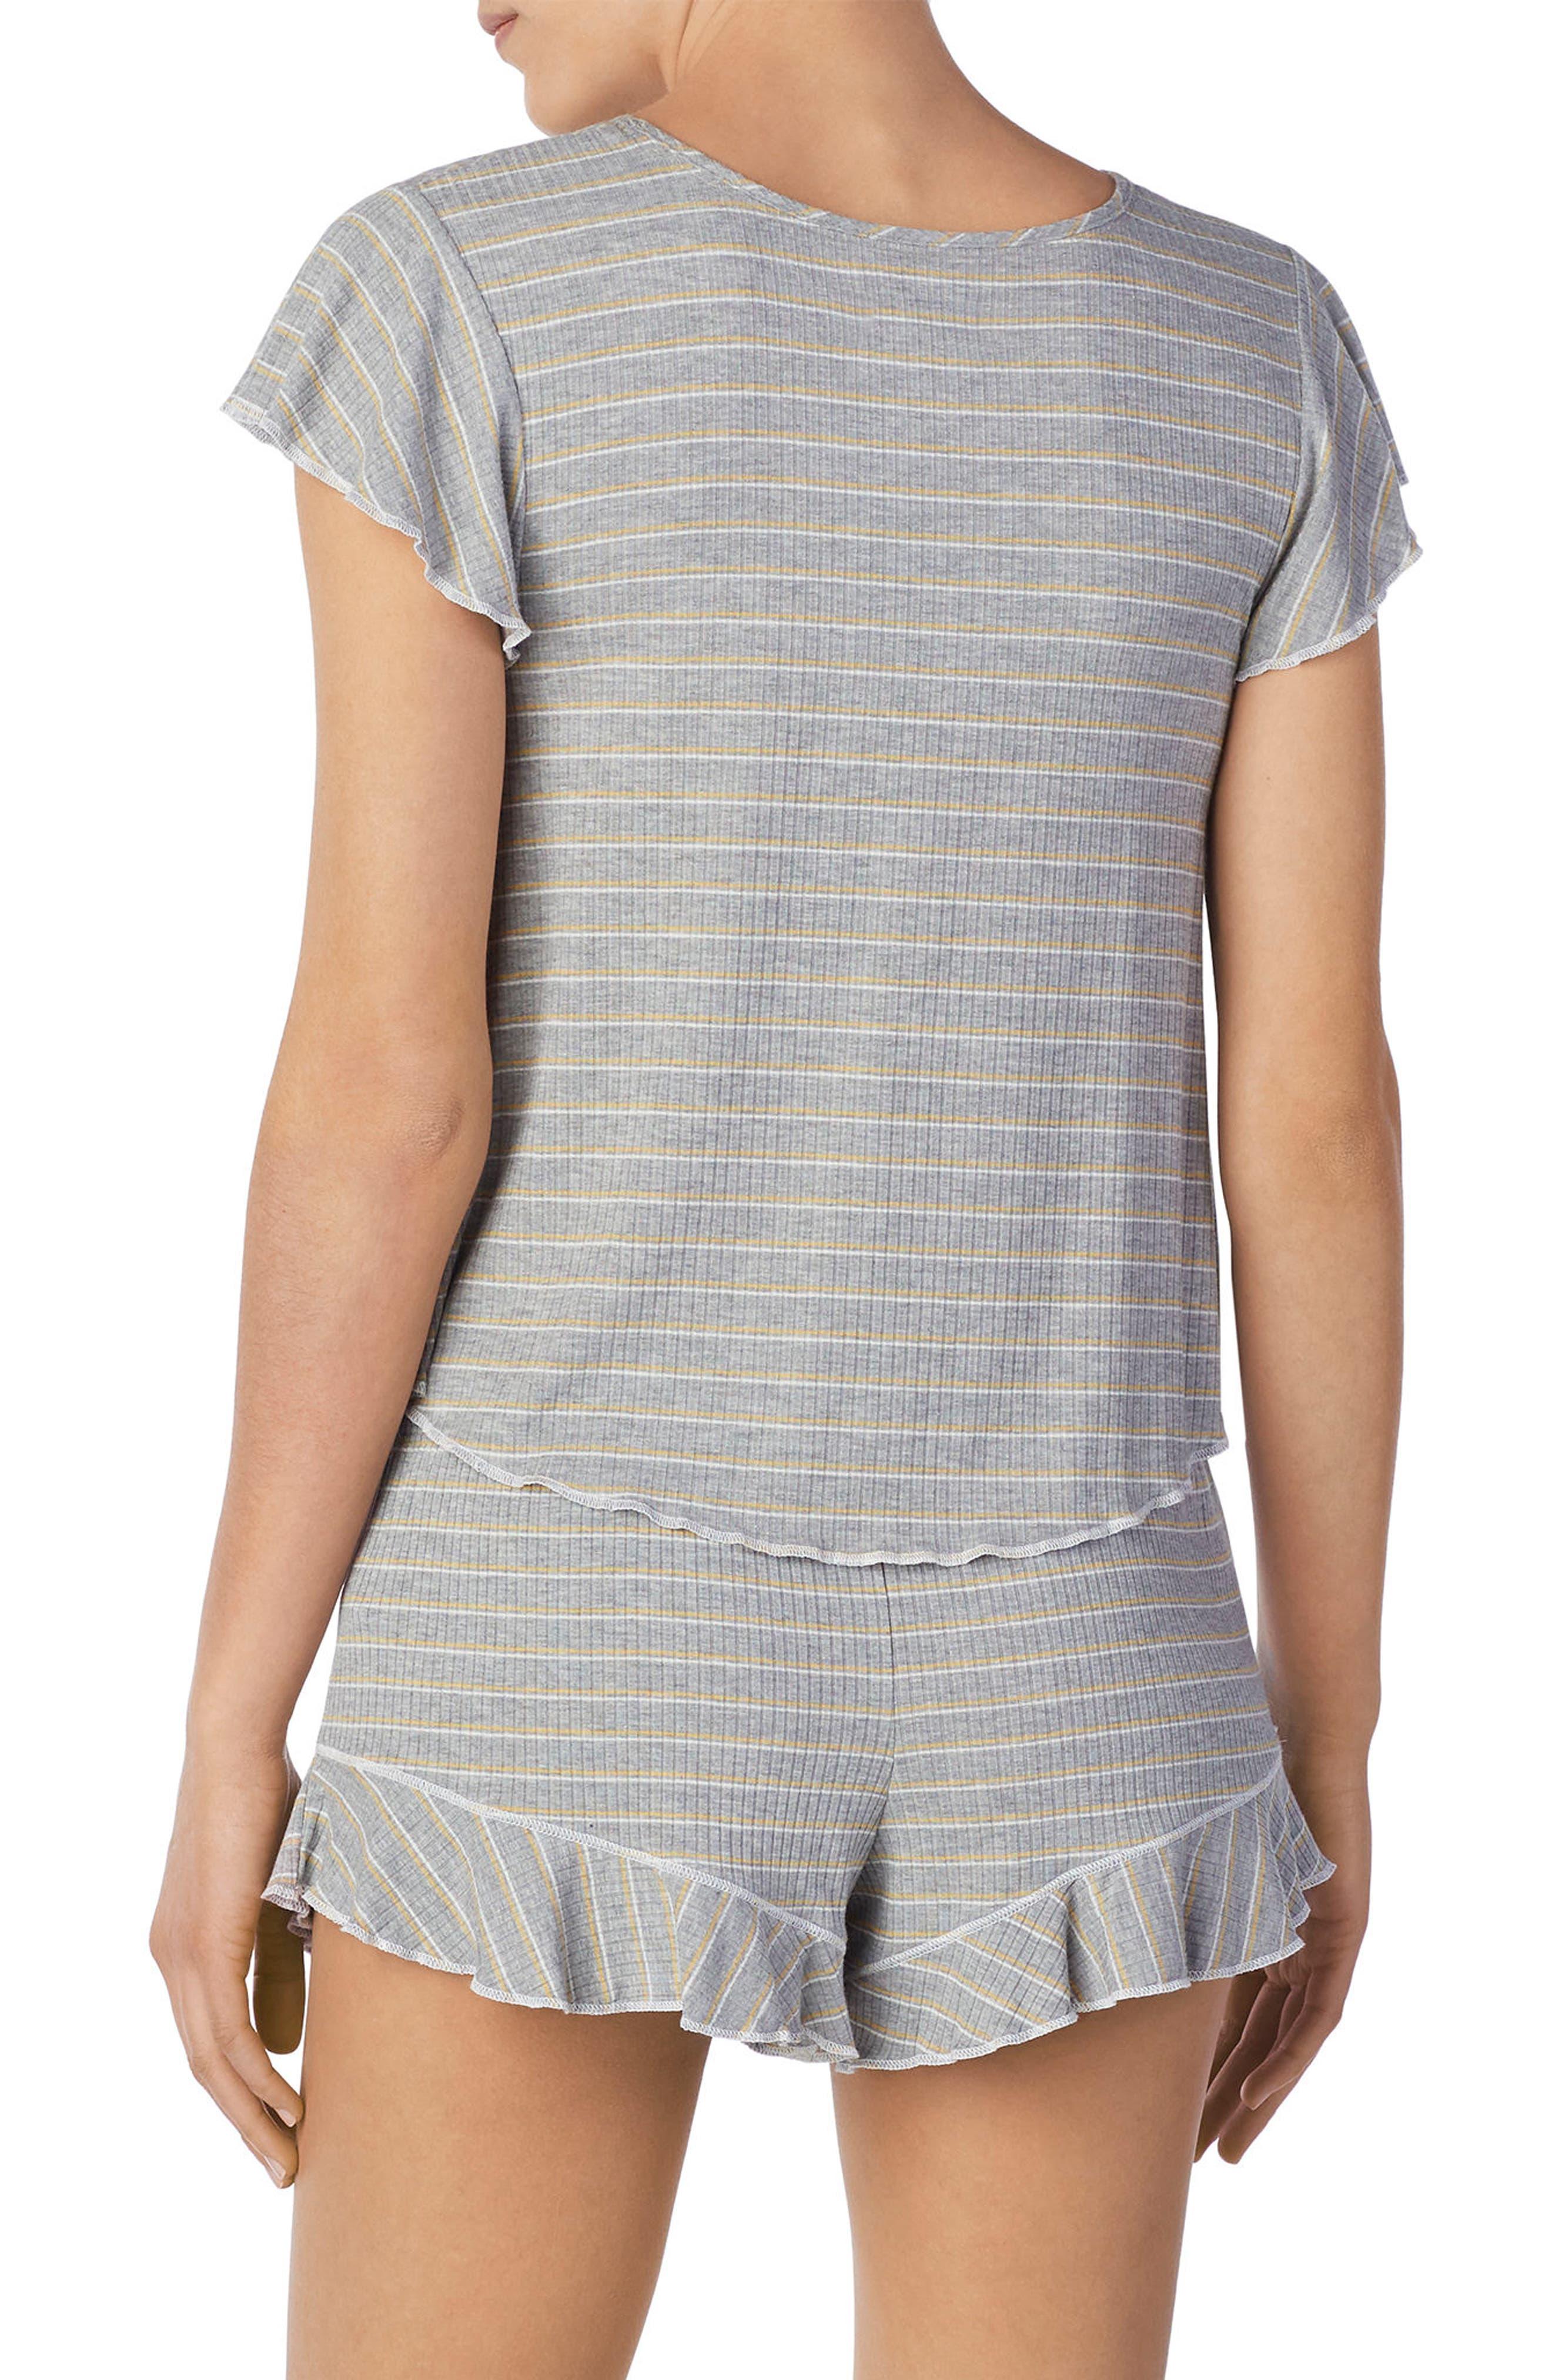 Stripe Short Pajamas,                             Alternate thumbnail 2, color,                             Grey Heather